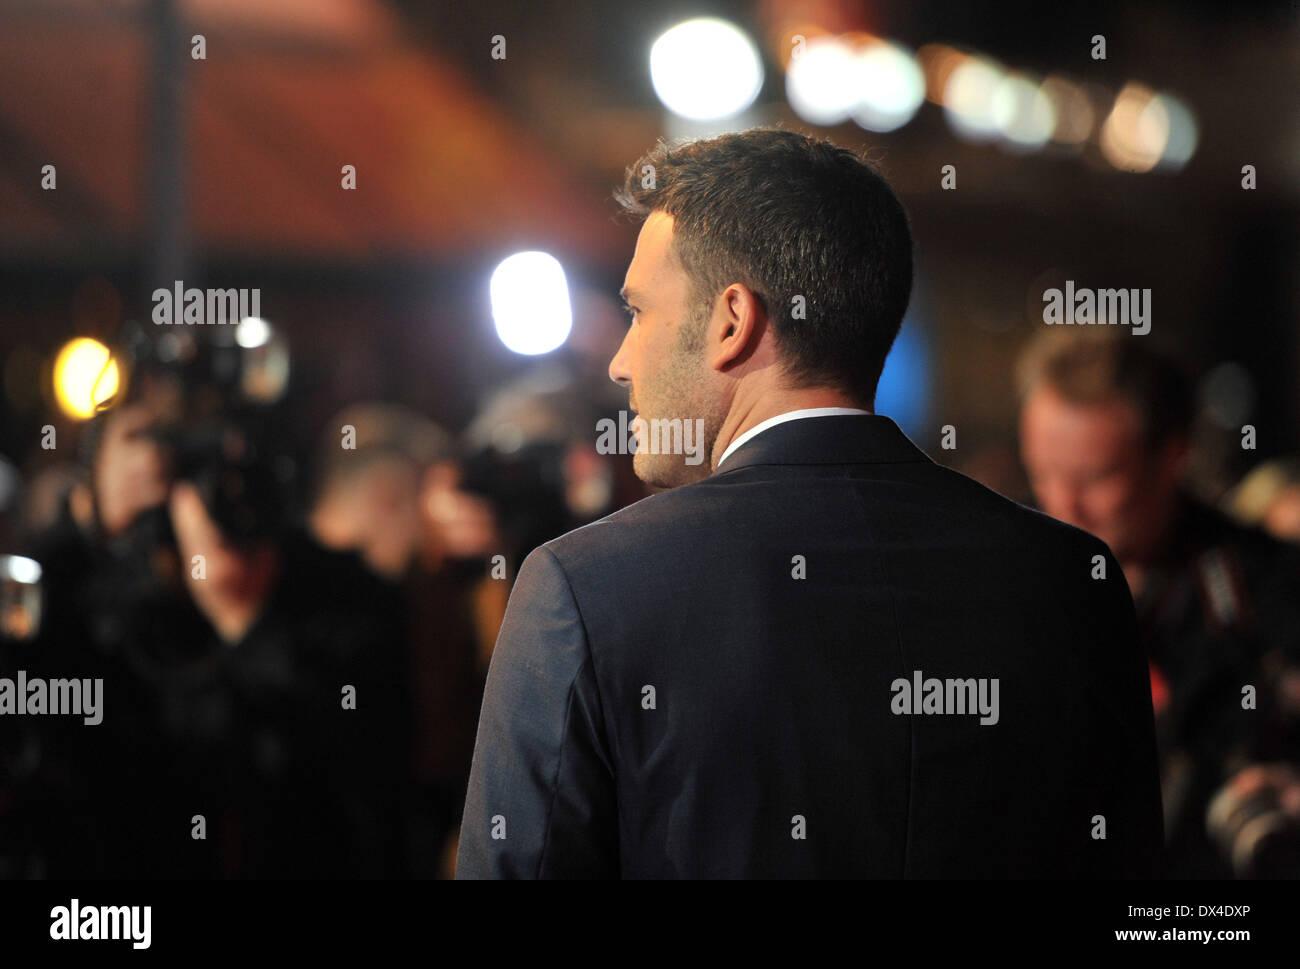 Ben Affleck 56th BFI London Film Festival: Argo - Accenture gala tenu à l'Odeon Leicester Square - Arrivées. Londres, Angleterre - 17.10.12 Avec: Ben Affleck Où: London, Royaume-Uni Quand: 17 Oct 2012 Photo Stock